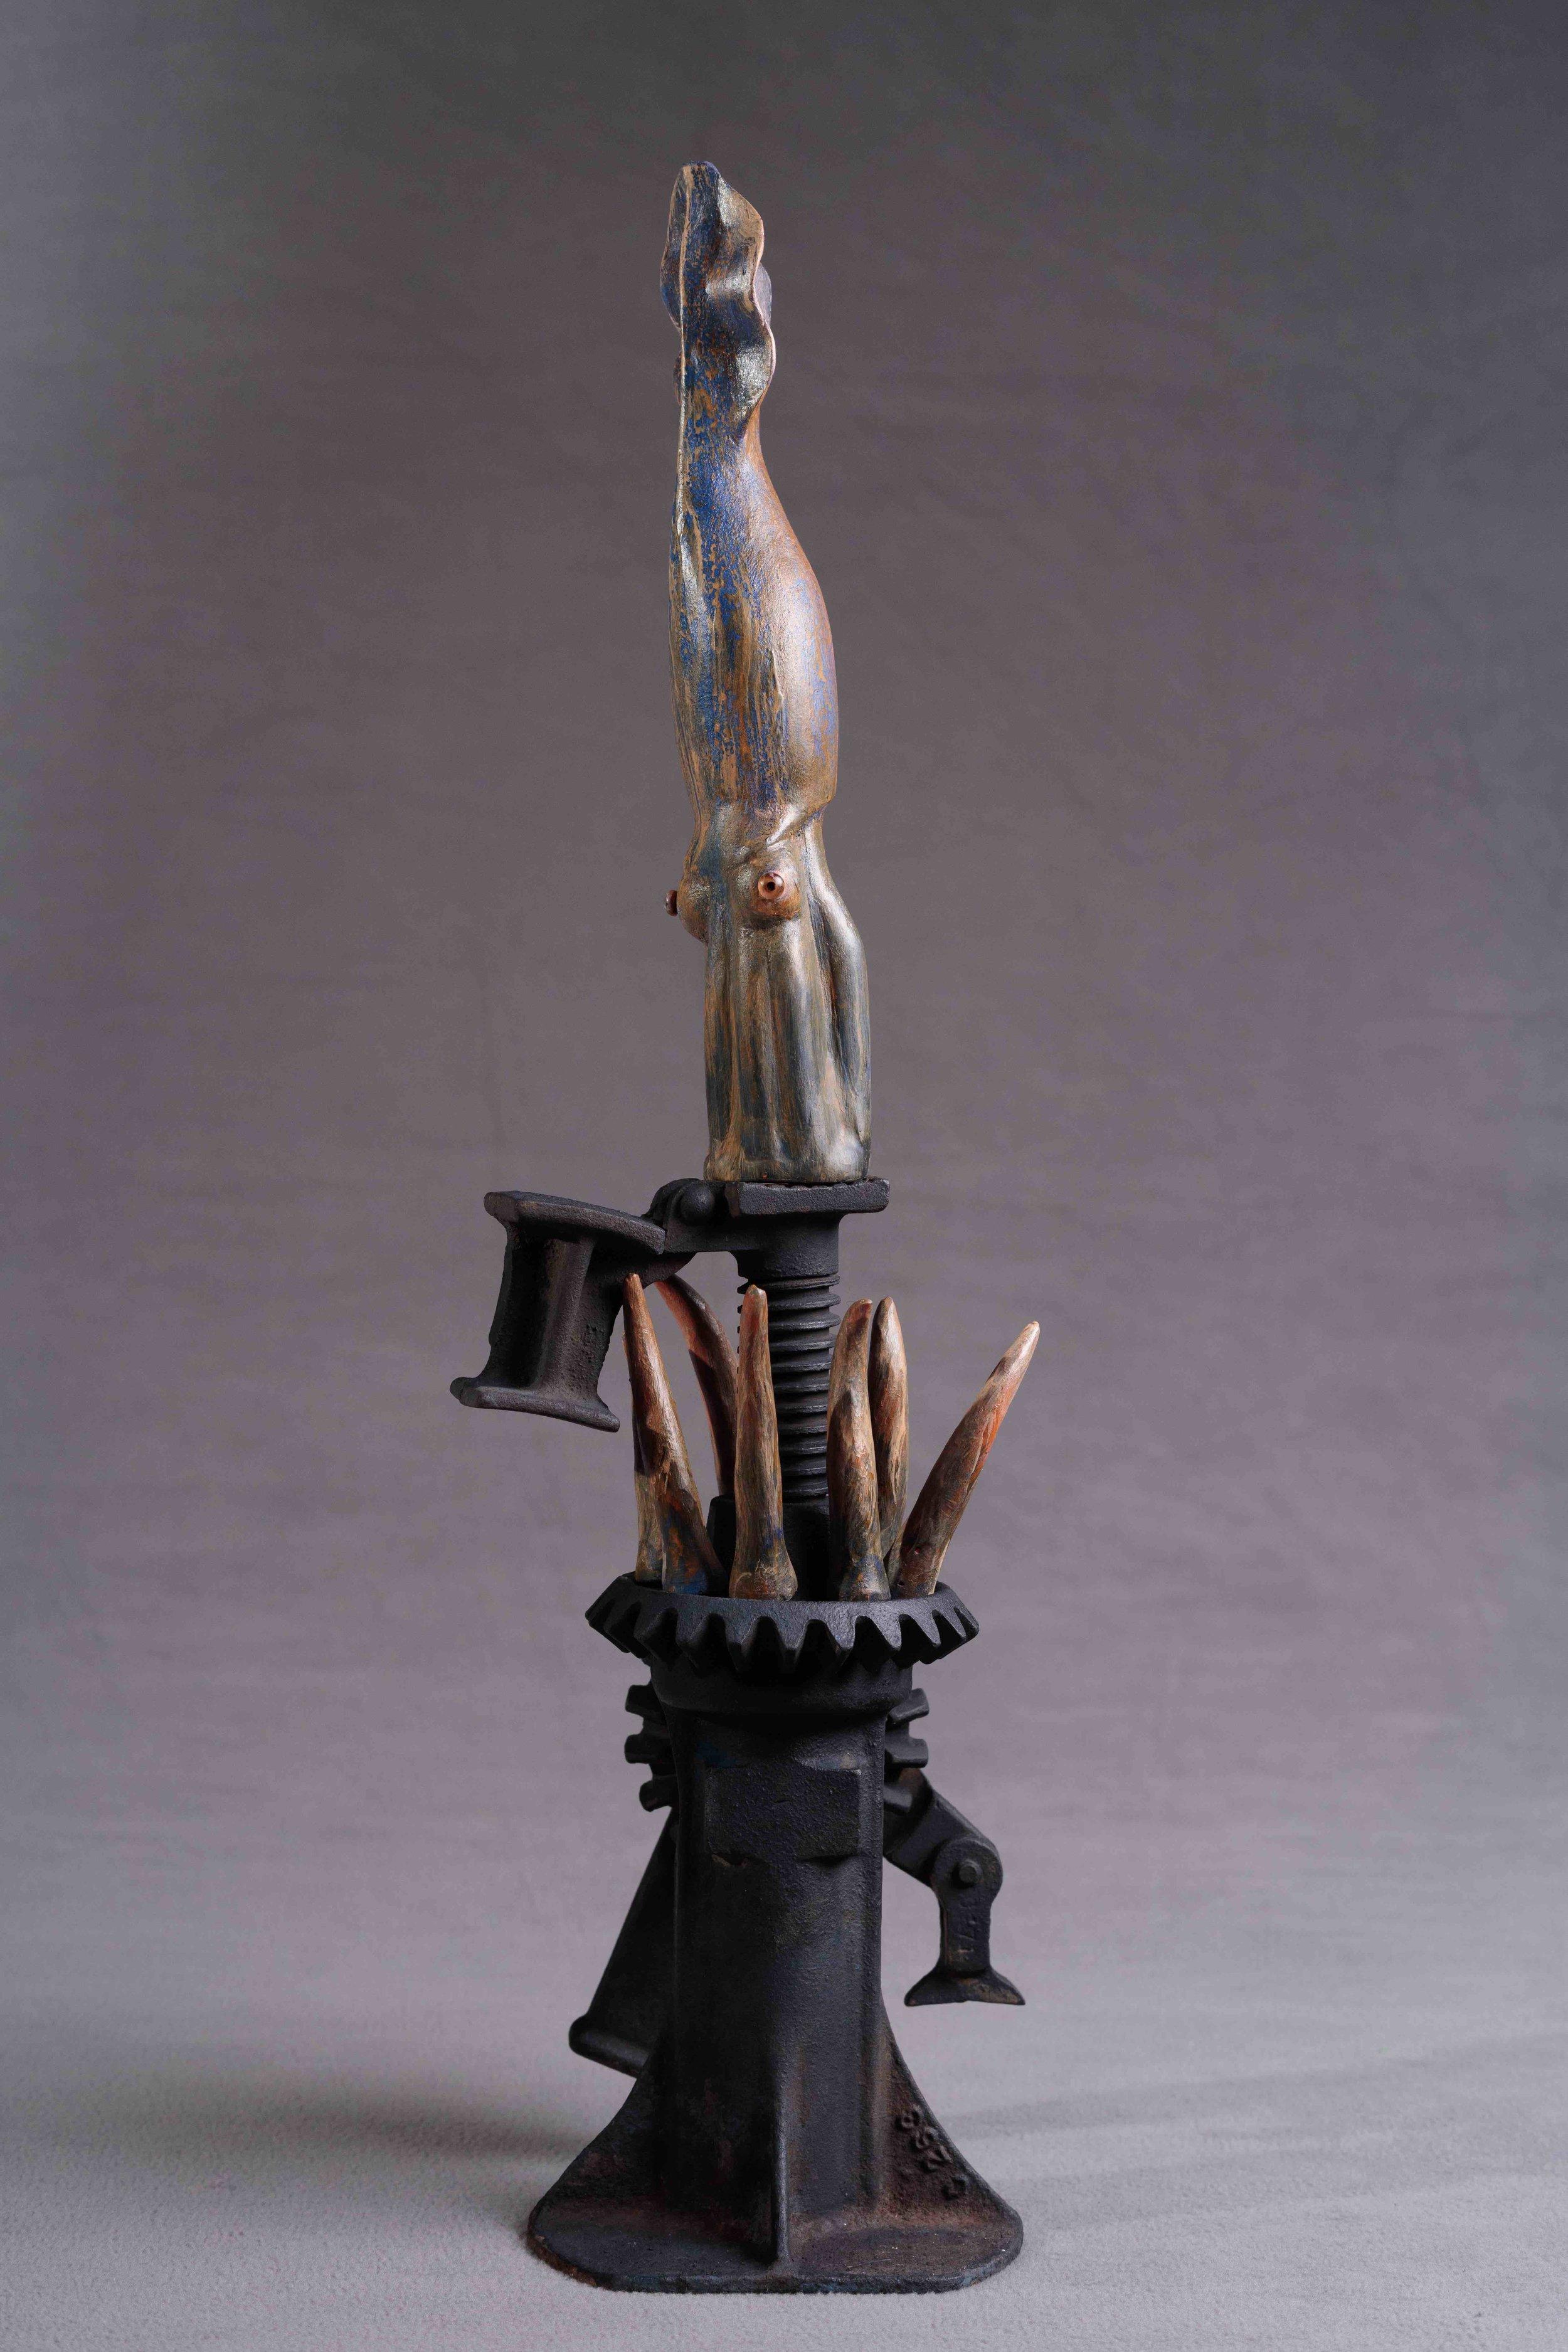 Squid & Jack, Opposites Attract, Feb. 2019,Boston Sculptors Gallery